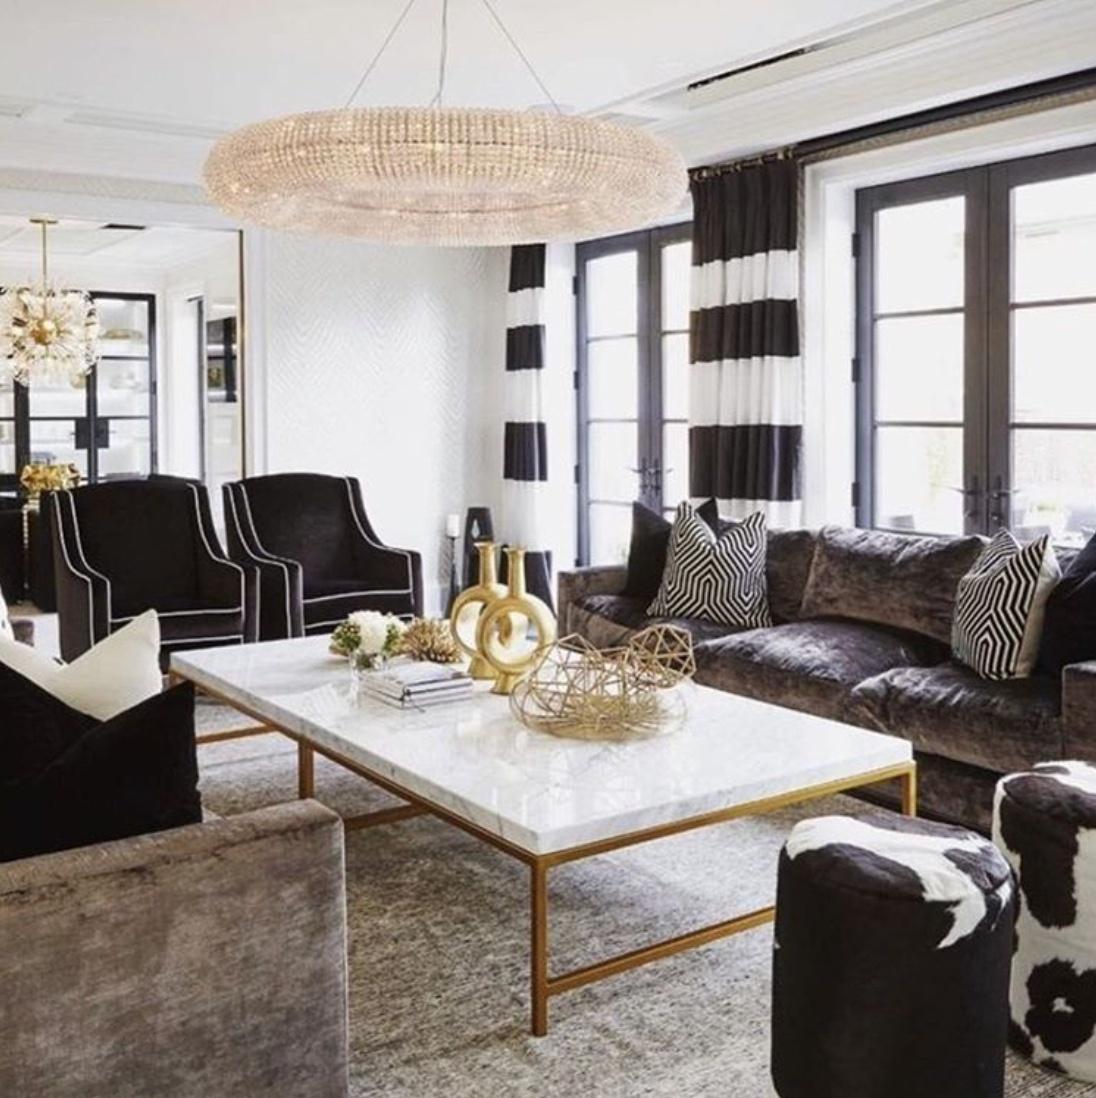 20 Black And White Living Room Decor Ideas - The Wonder Cottage